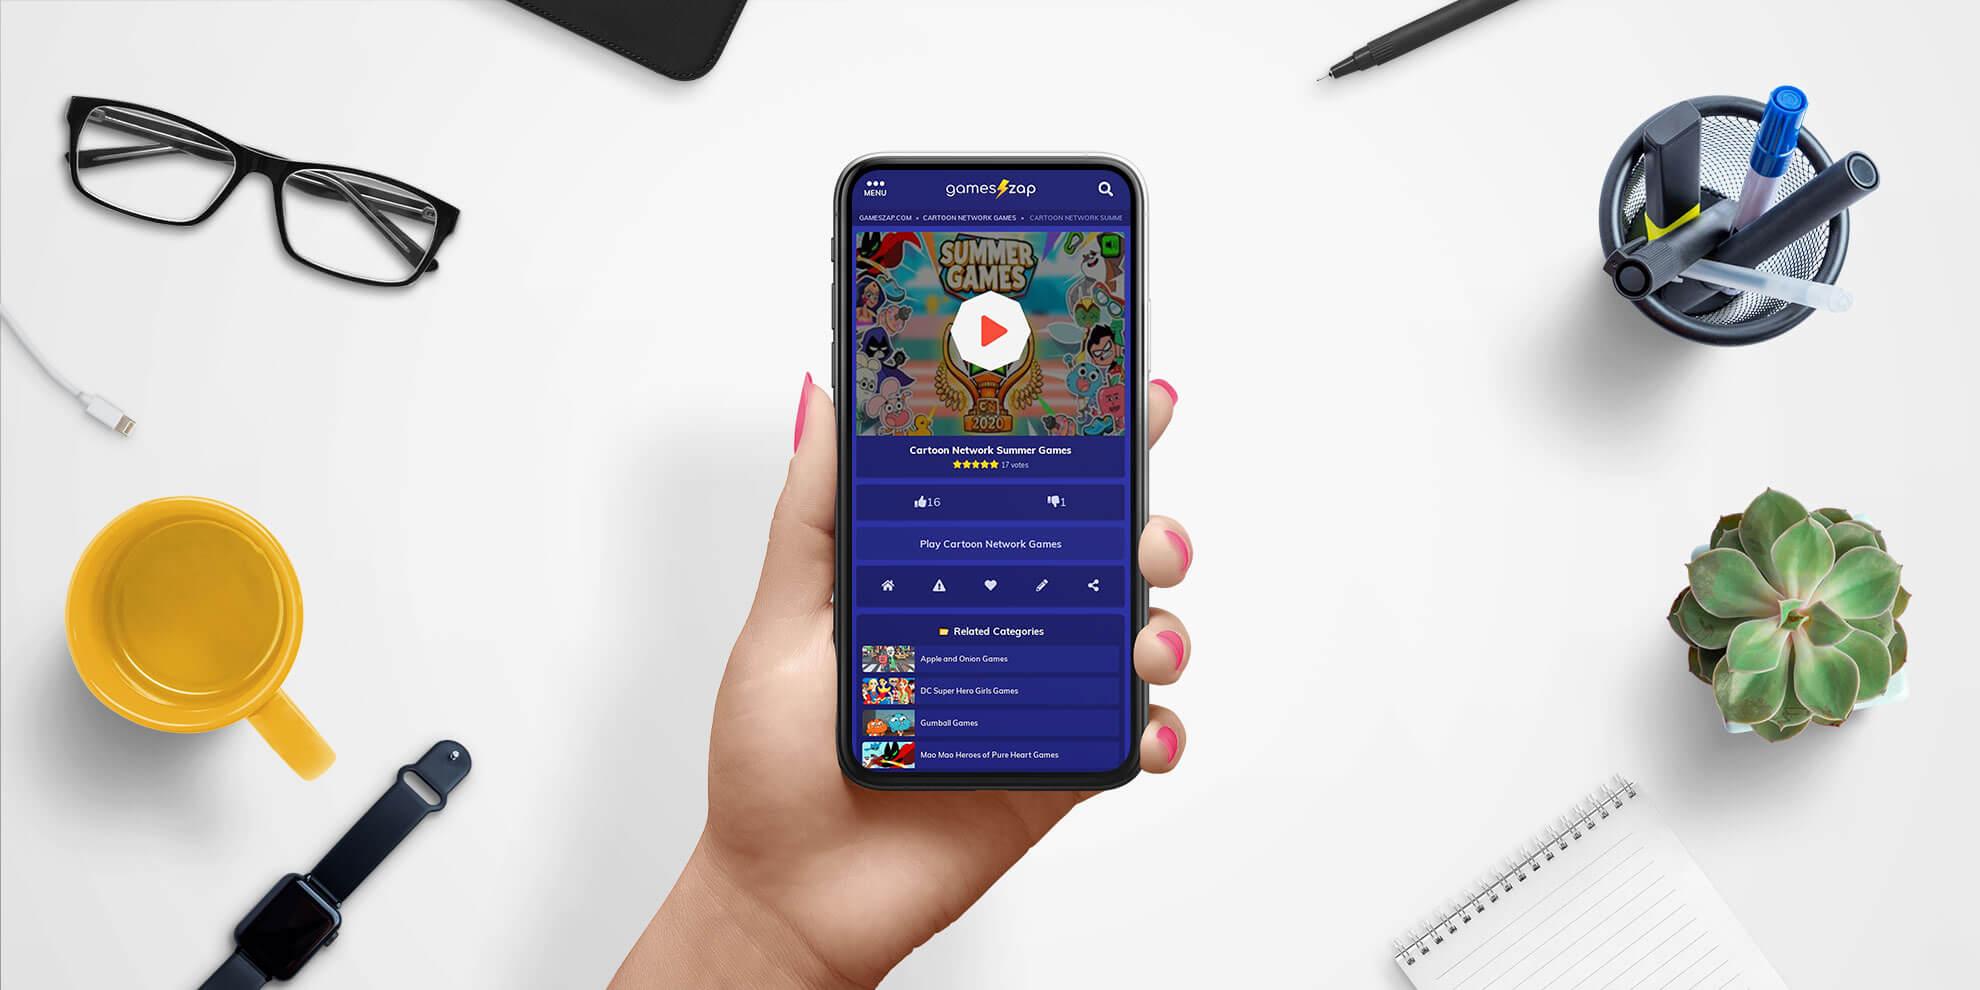 design gameszap site cu jocuri online